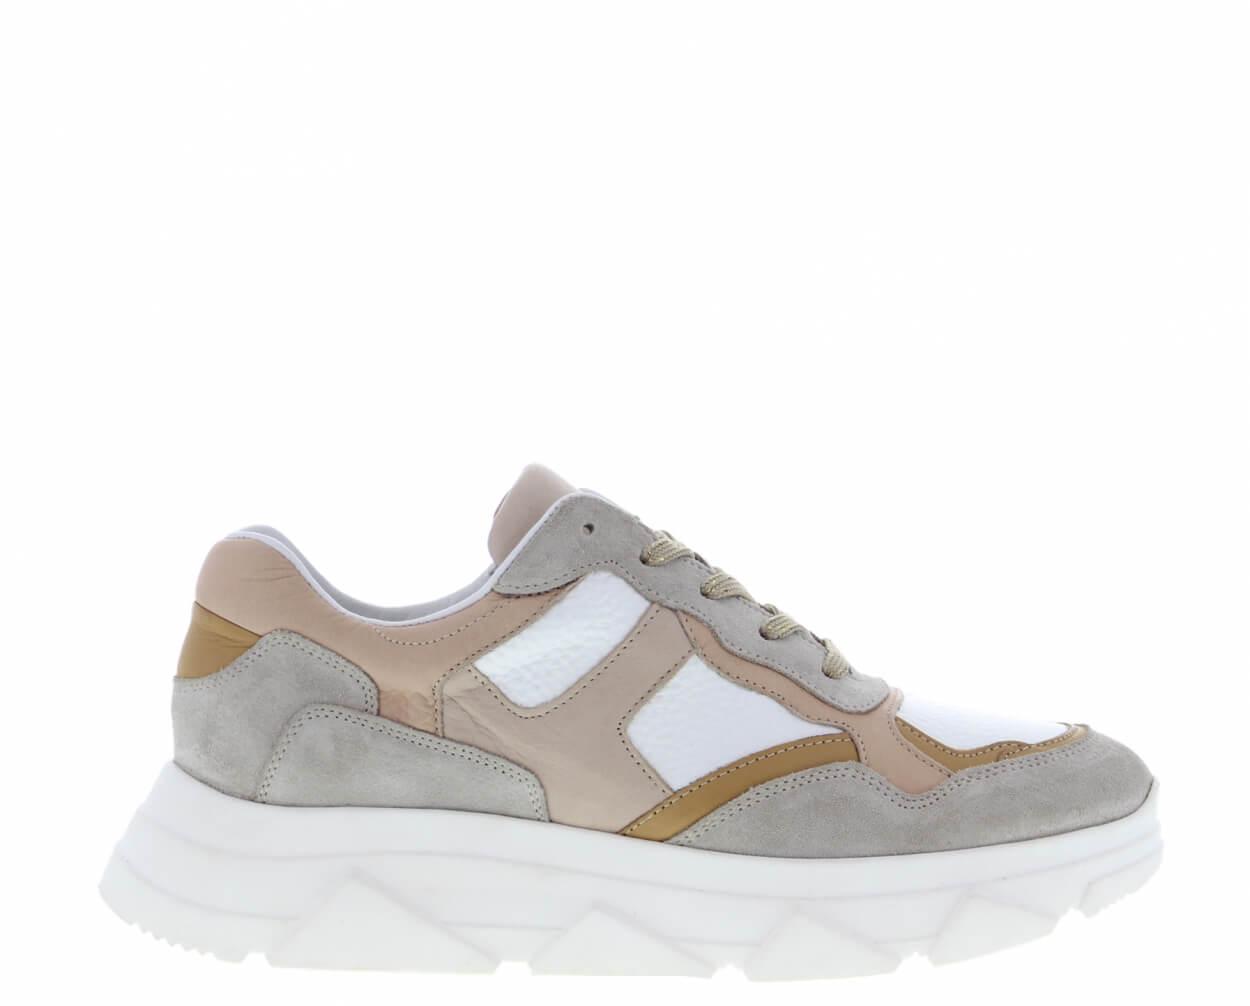 TANGO Sneaker Kady Fat Natural/Beige/Nude   Artikelnummer:kady.fat.10DA 450